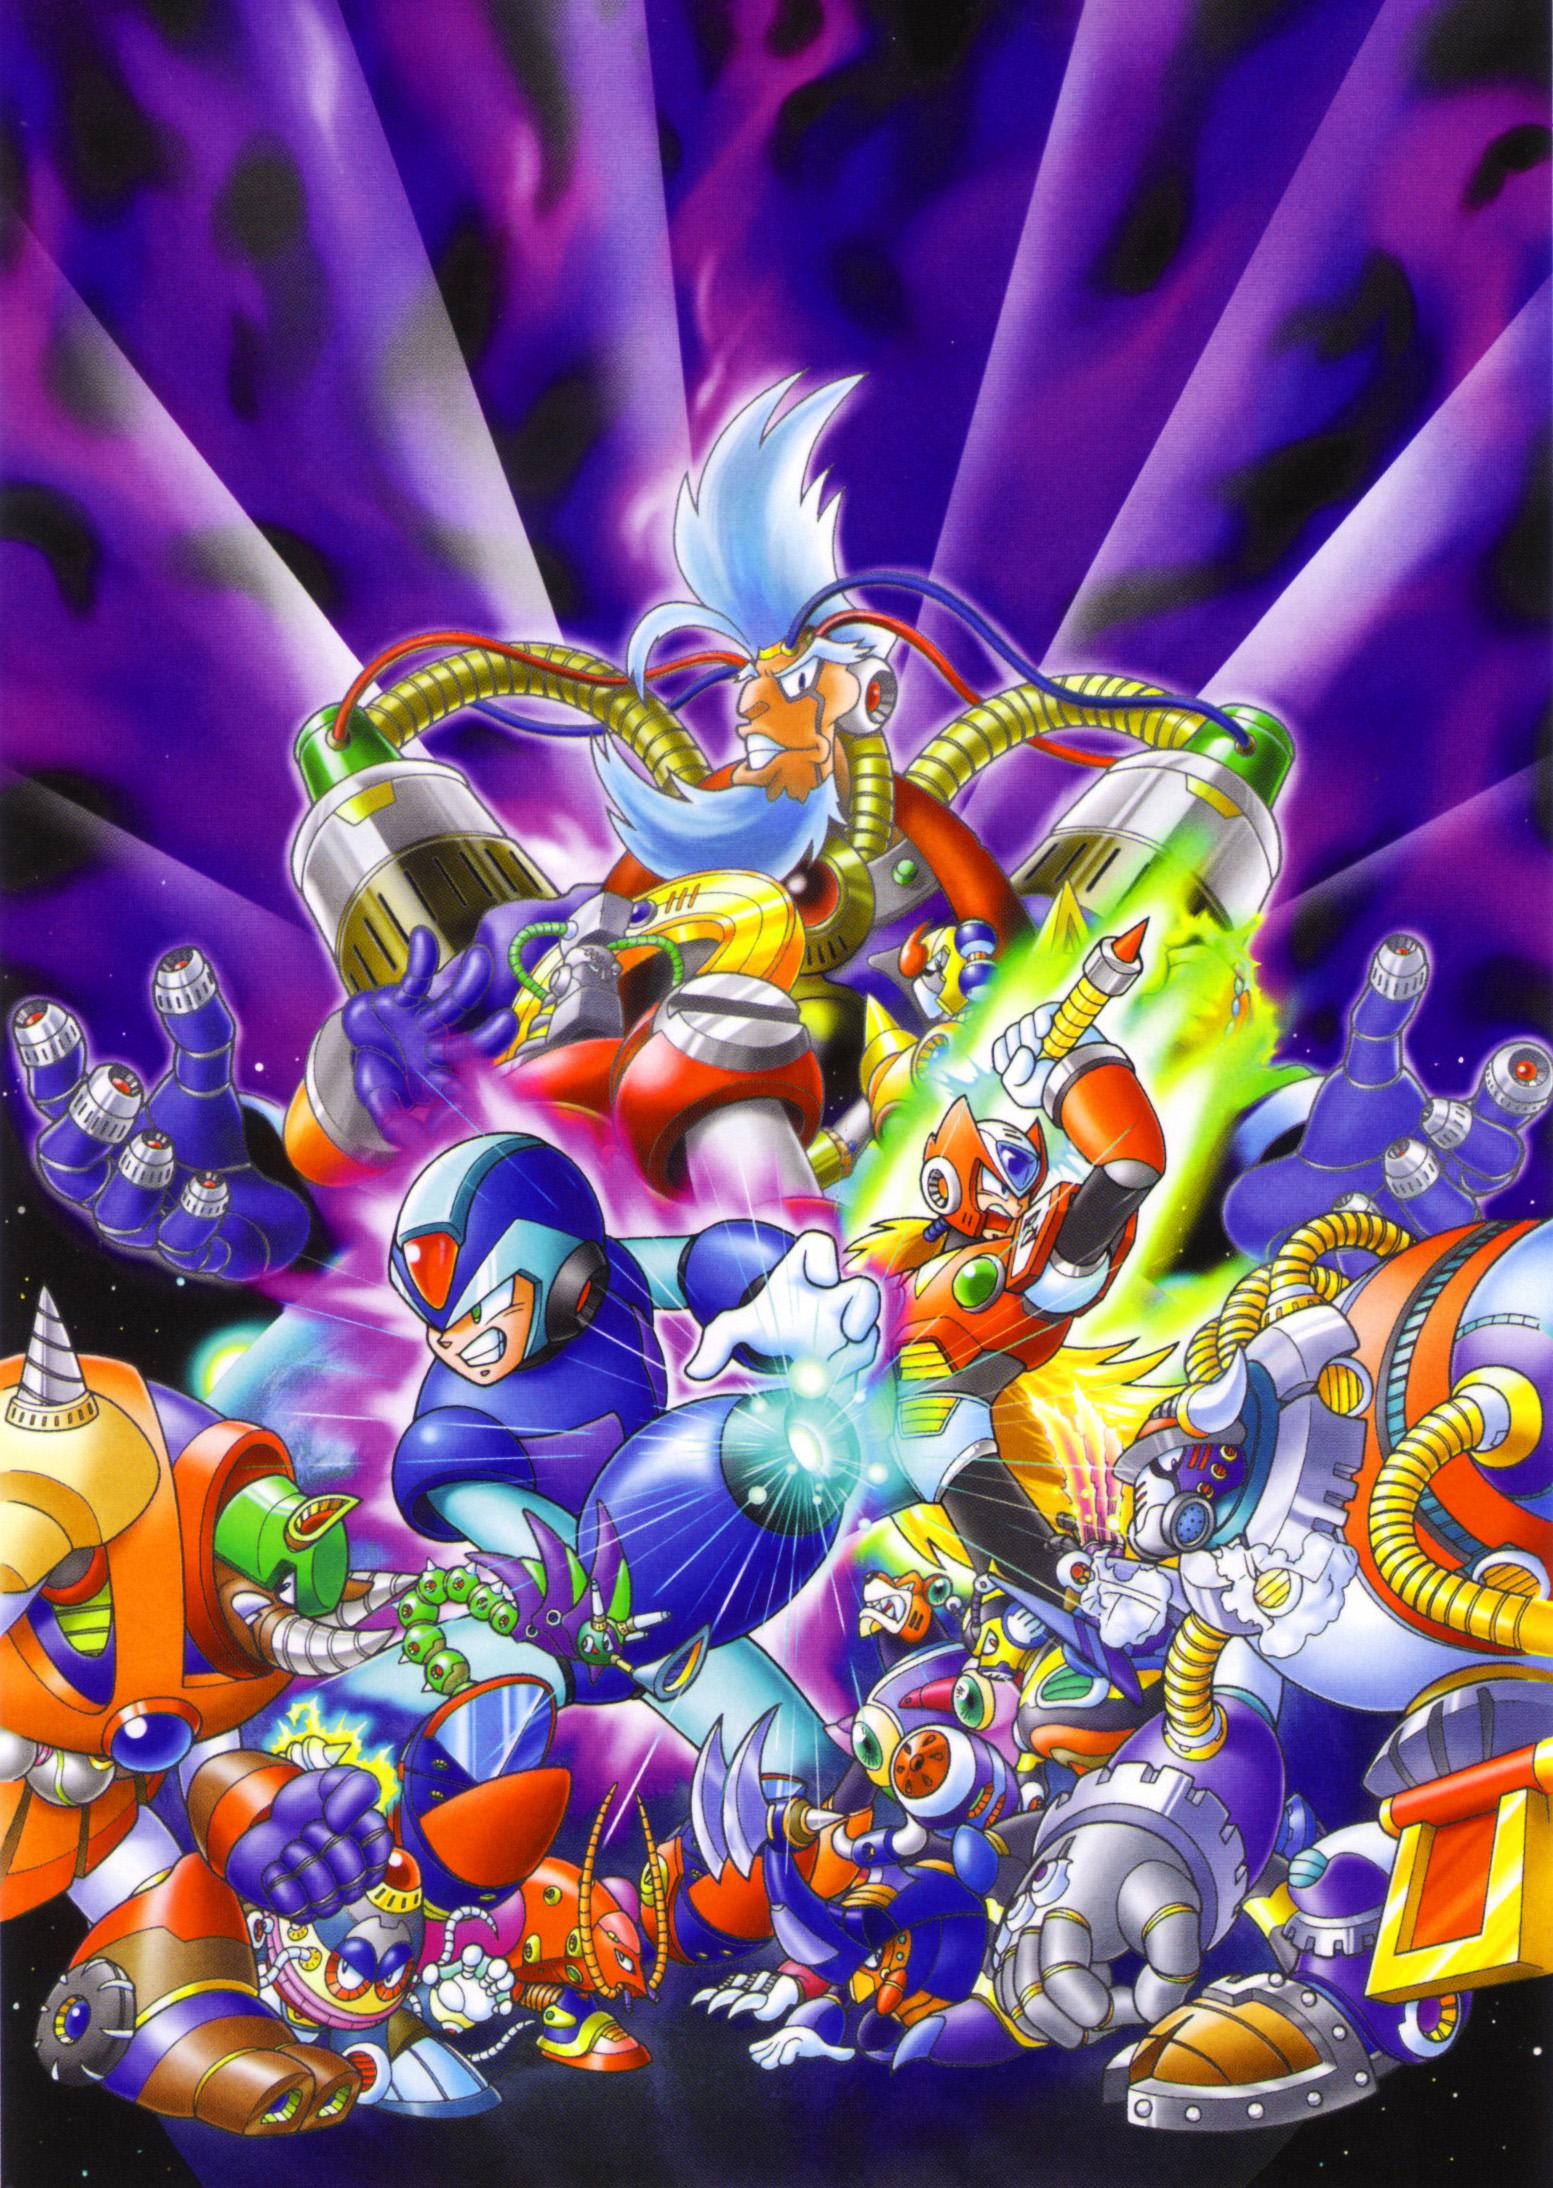 Mega man x3 mmkb fandom powered by wikia - Megaman wikia ...